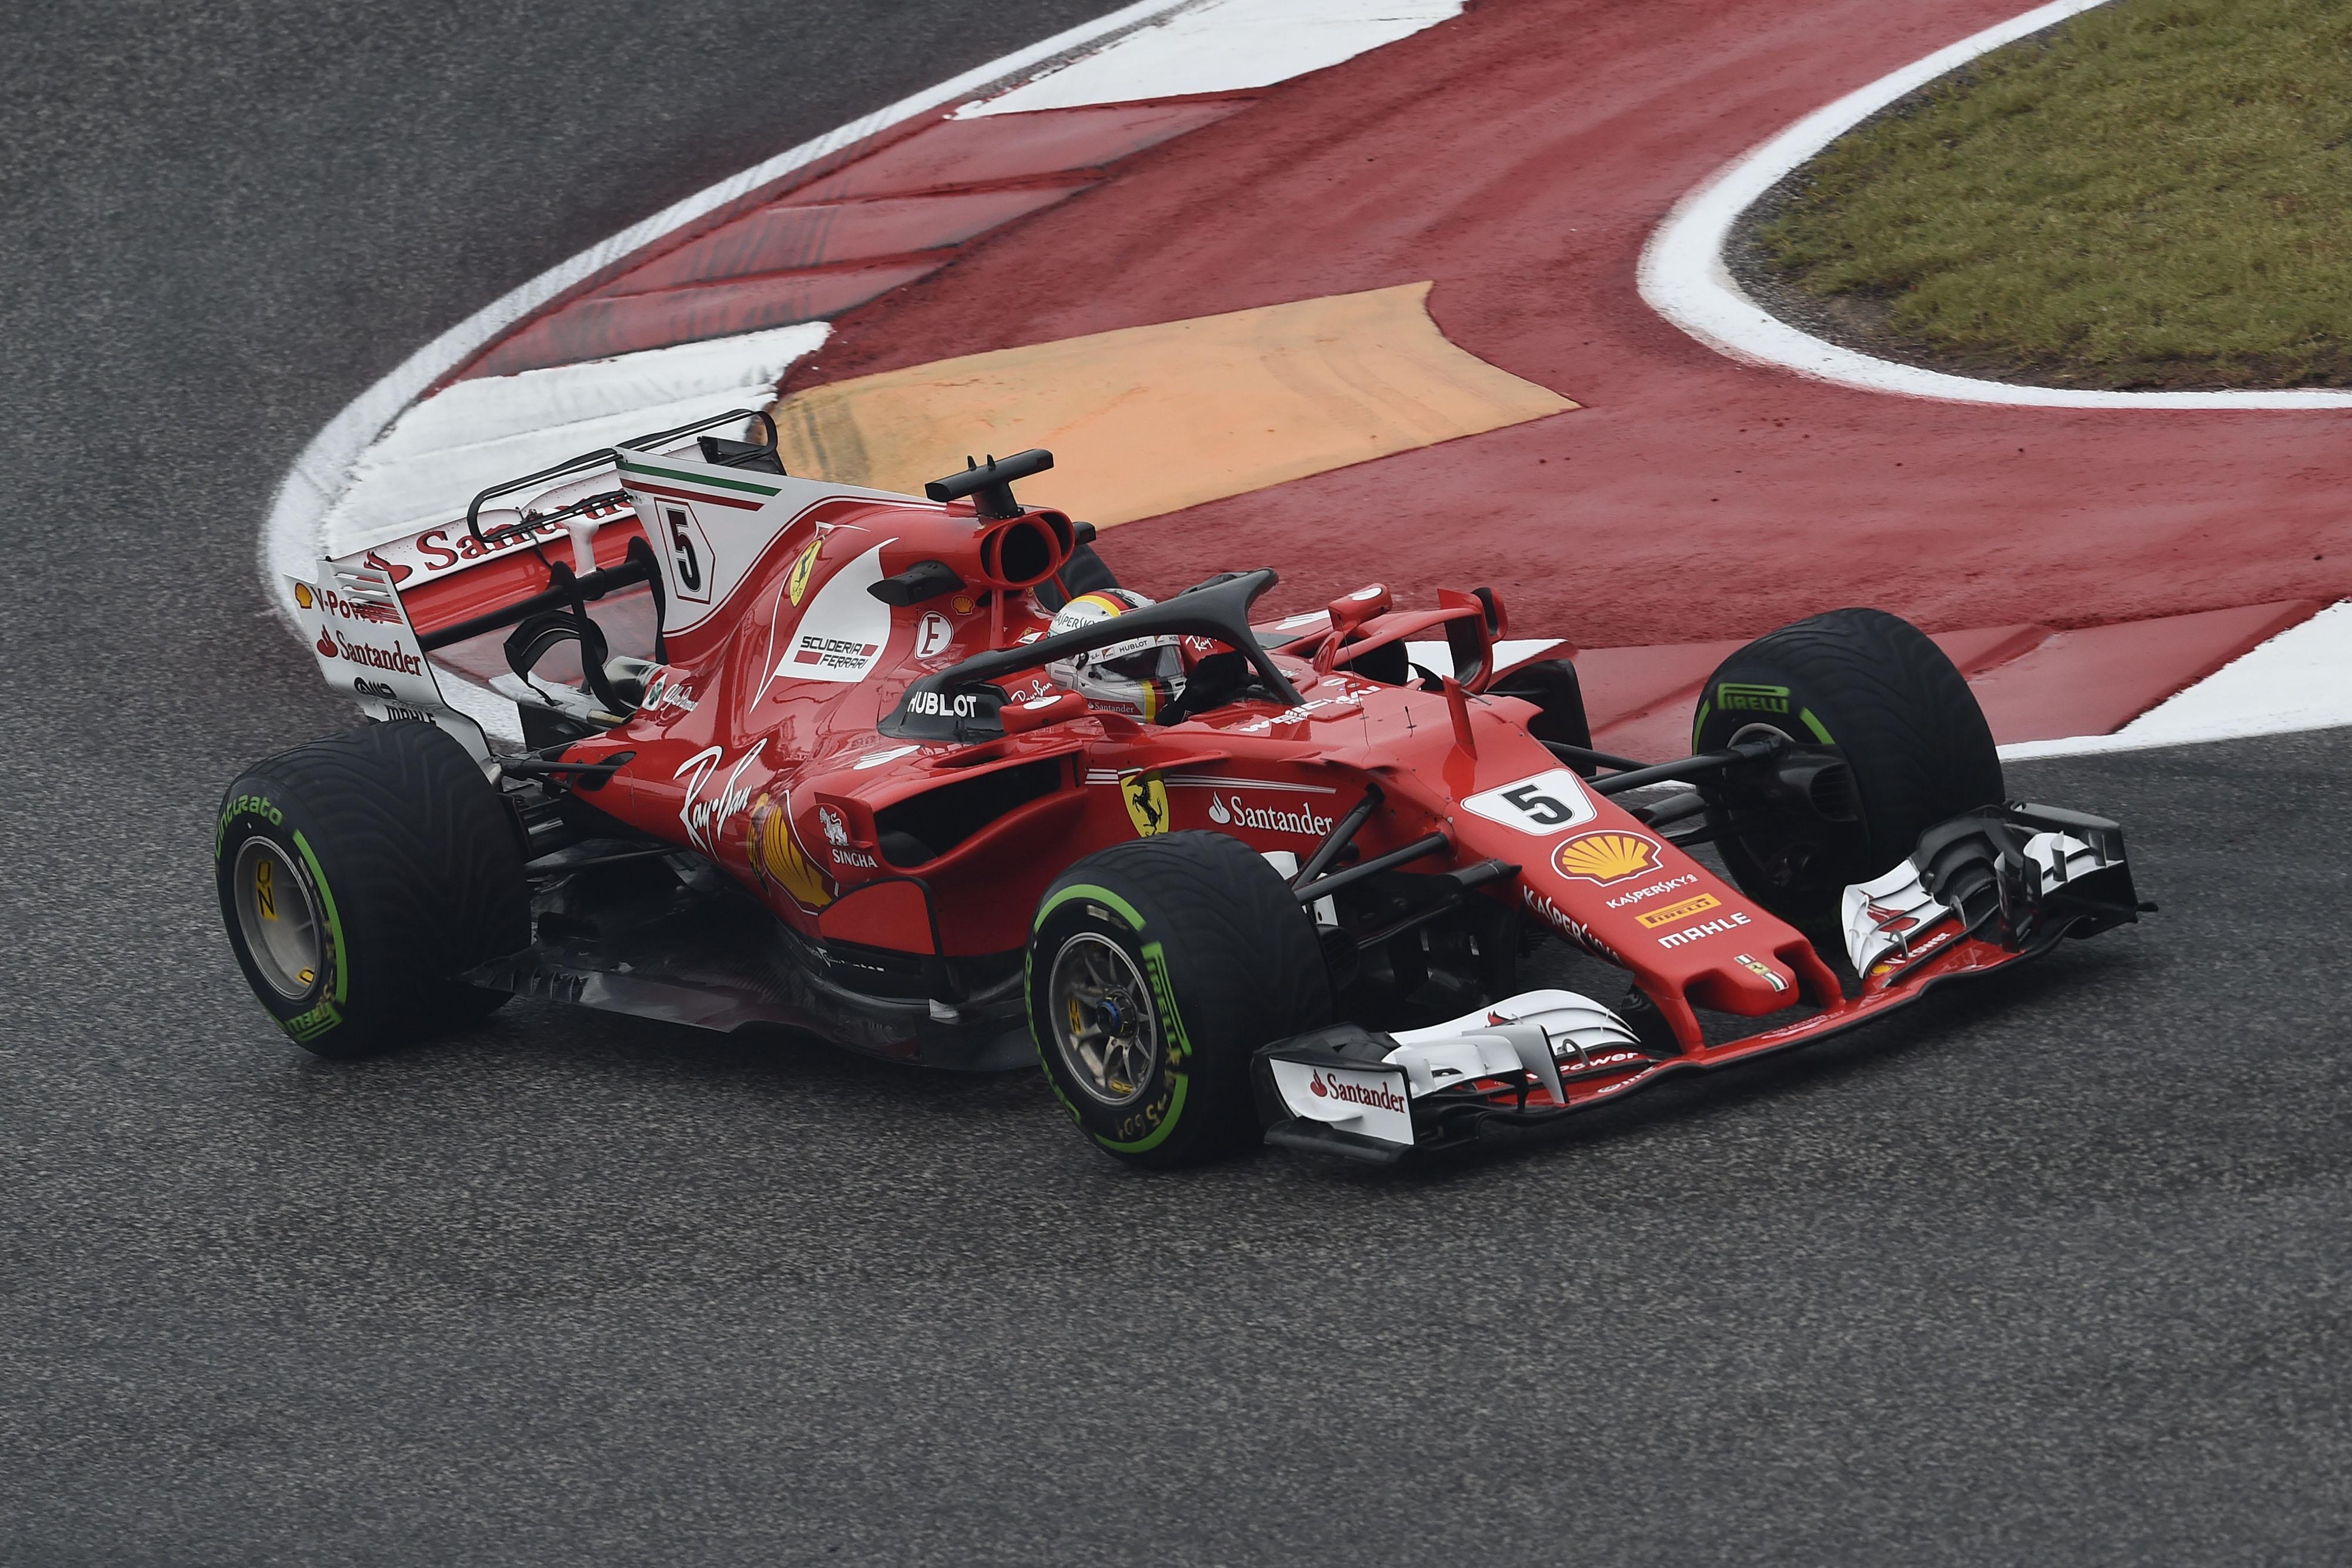 Formula 1: Hamilton vince il GP USA a Austin, Vettel 2°, Raikkonen 3° - image 1-2 on https://motori.net